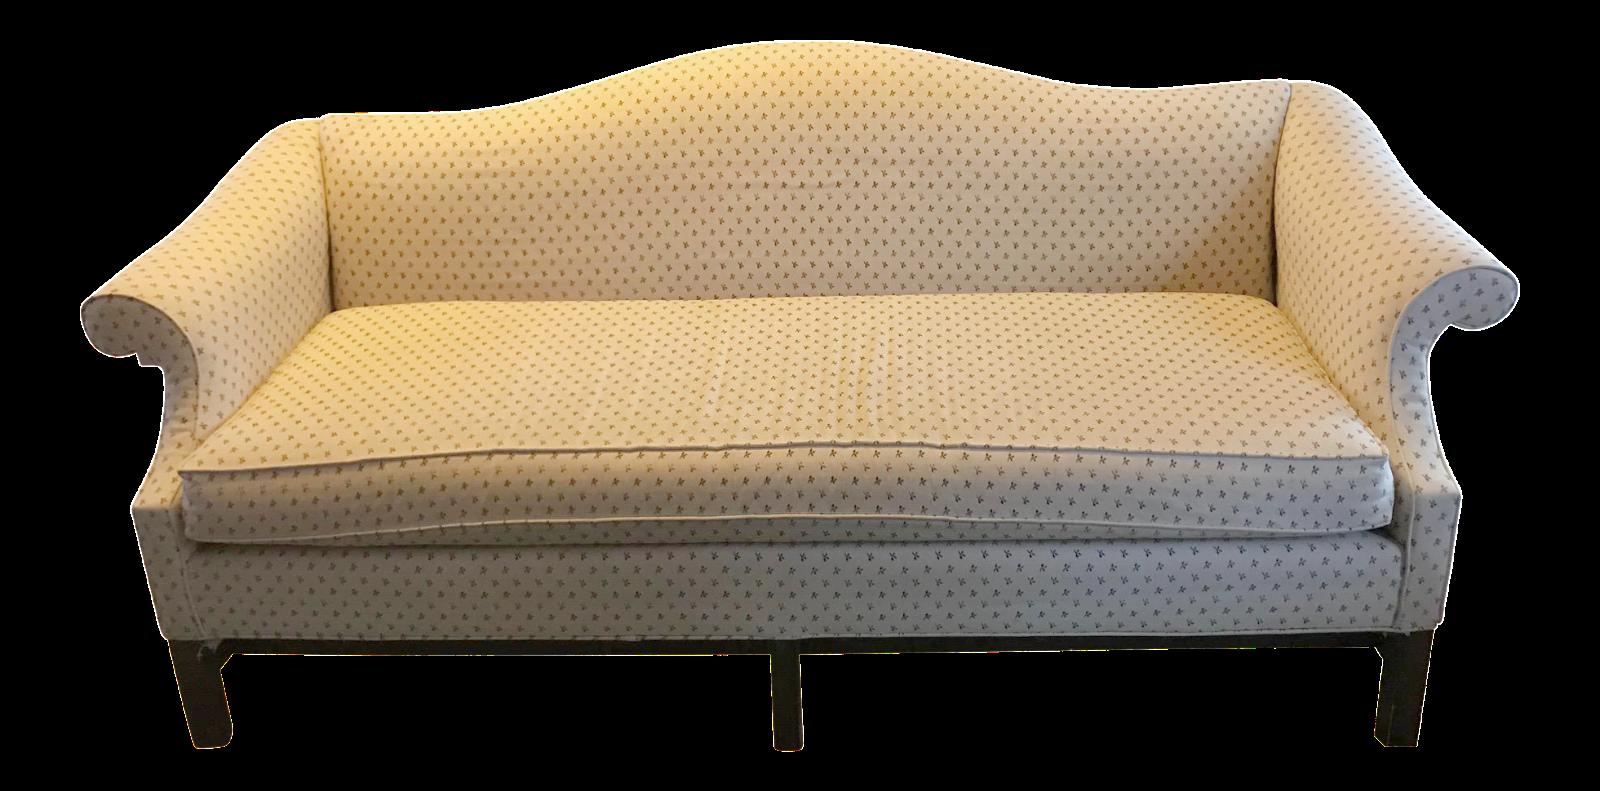 Classic Regency Beige Camelback Sofa For Sale Camelback Sofas For Sale P76